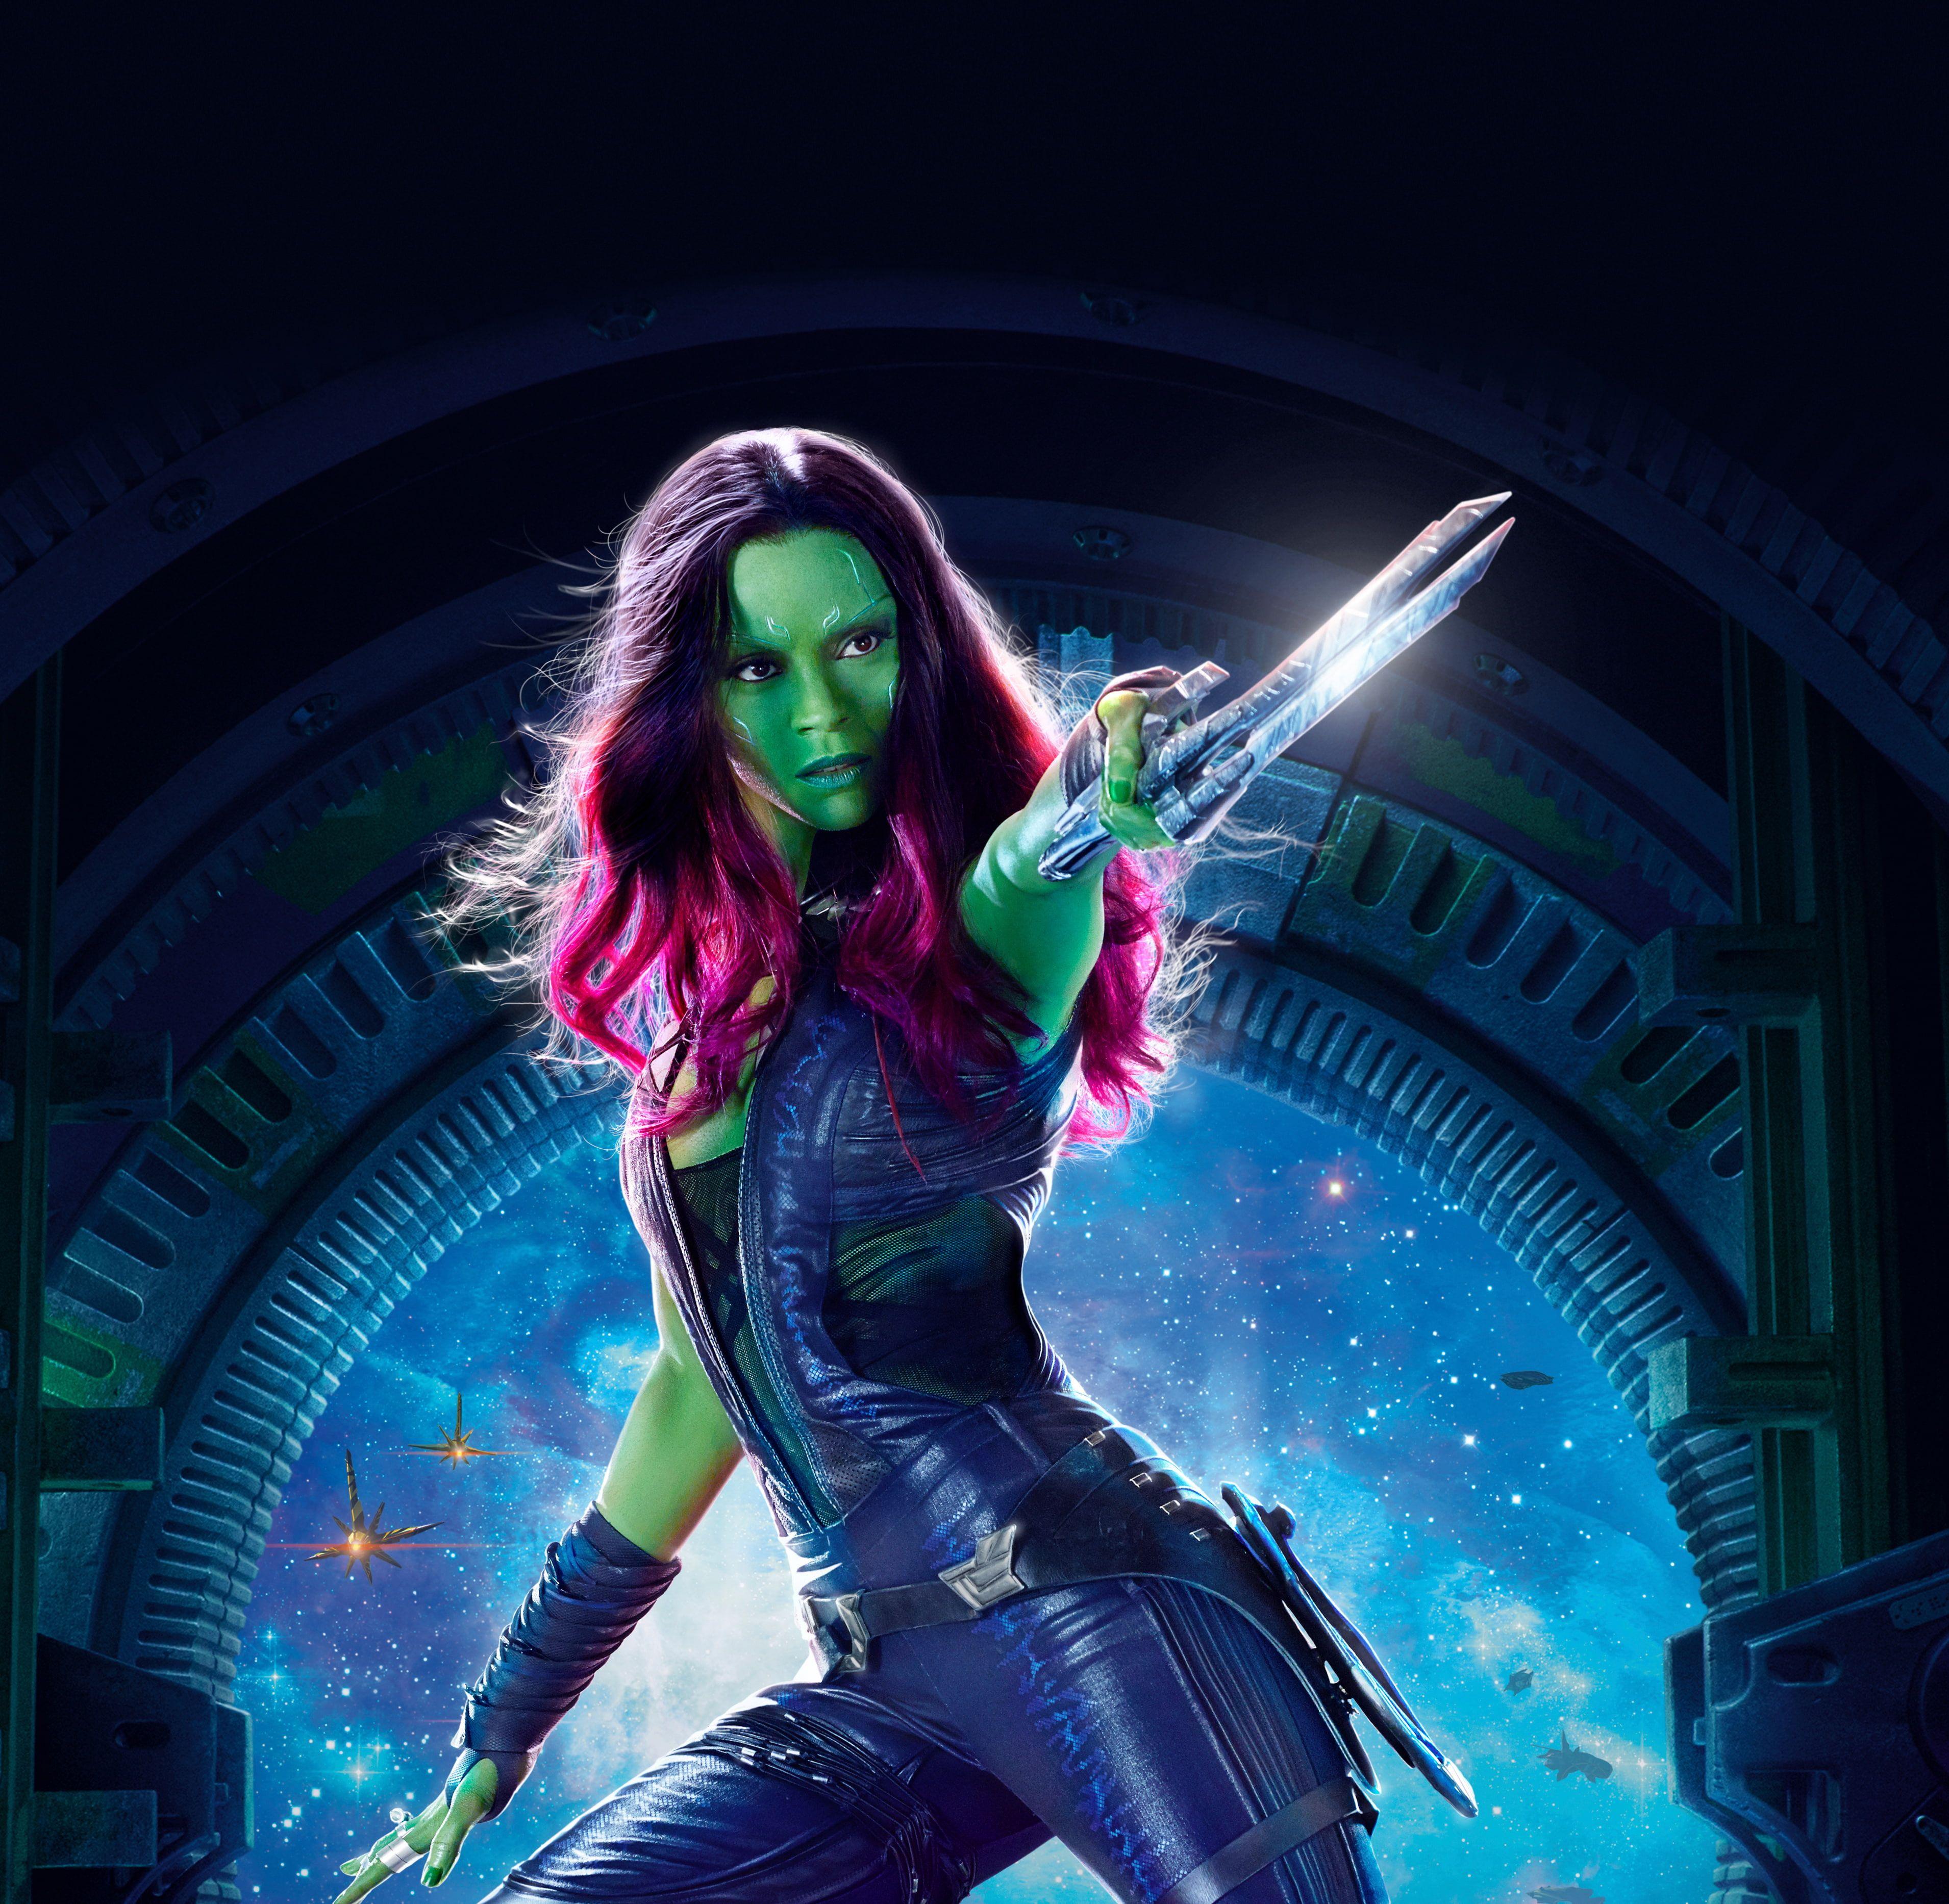 Gamora Zoe Saldana Guardians Of The Galaxy Vol 2 4k 2k Wallpaper Hdwallpaper Desktop Galaxy Movie Guardians Of The Galaxy Vol 2 Guardians Of The Galaxy